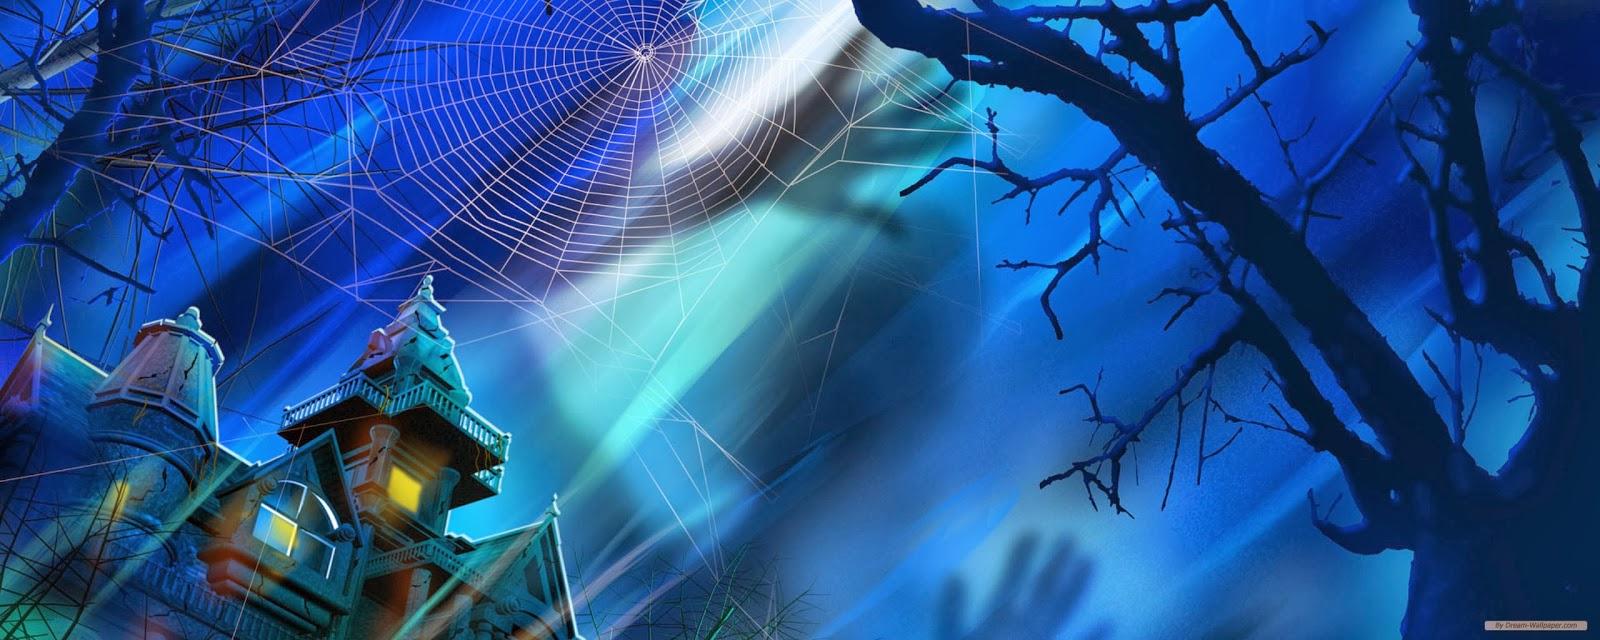 Halloween Dual Monitor Background 1600x640 Wallpaper Teahub Io